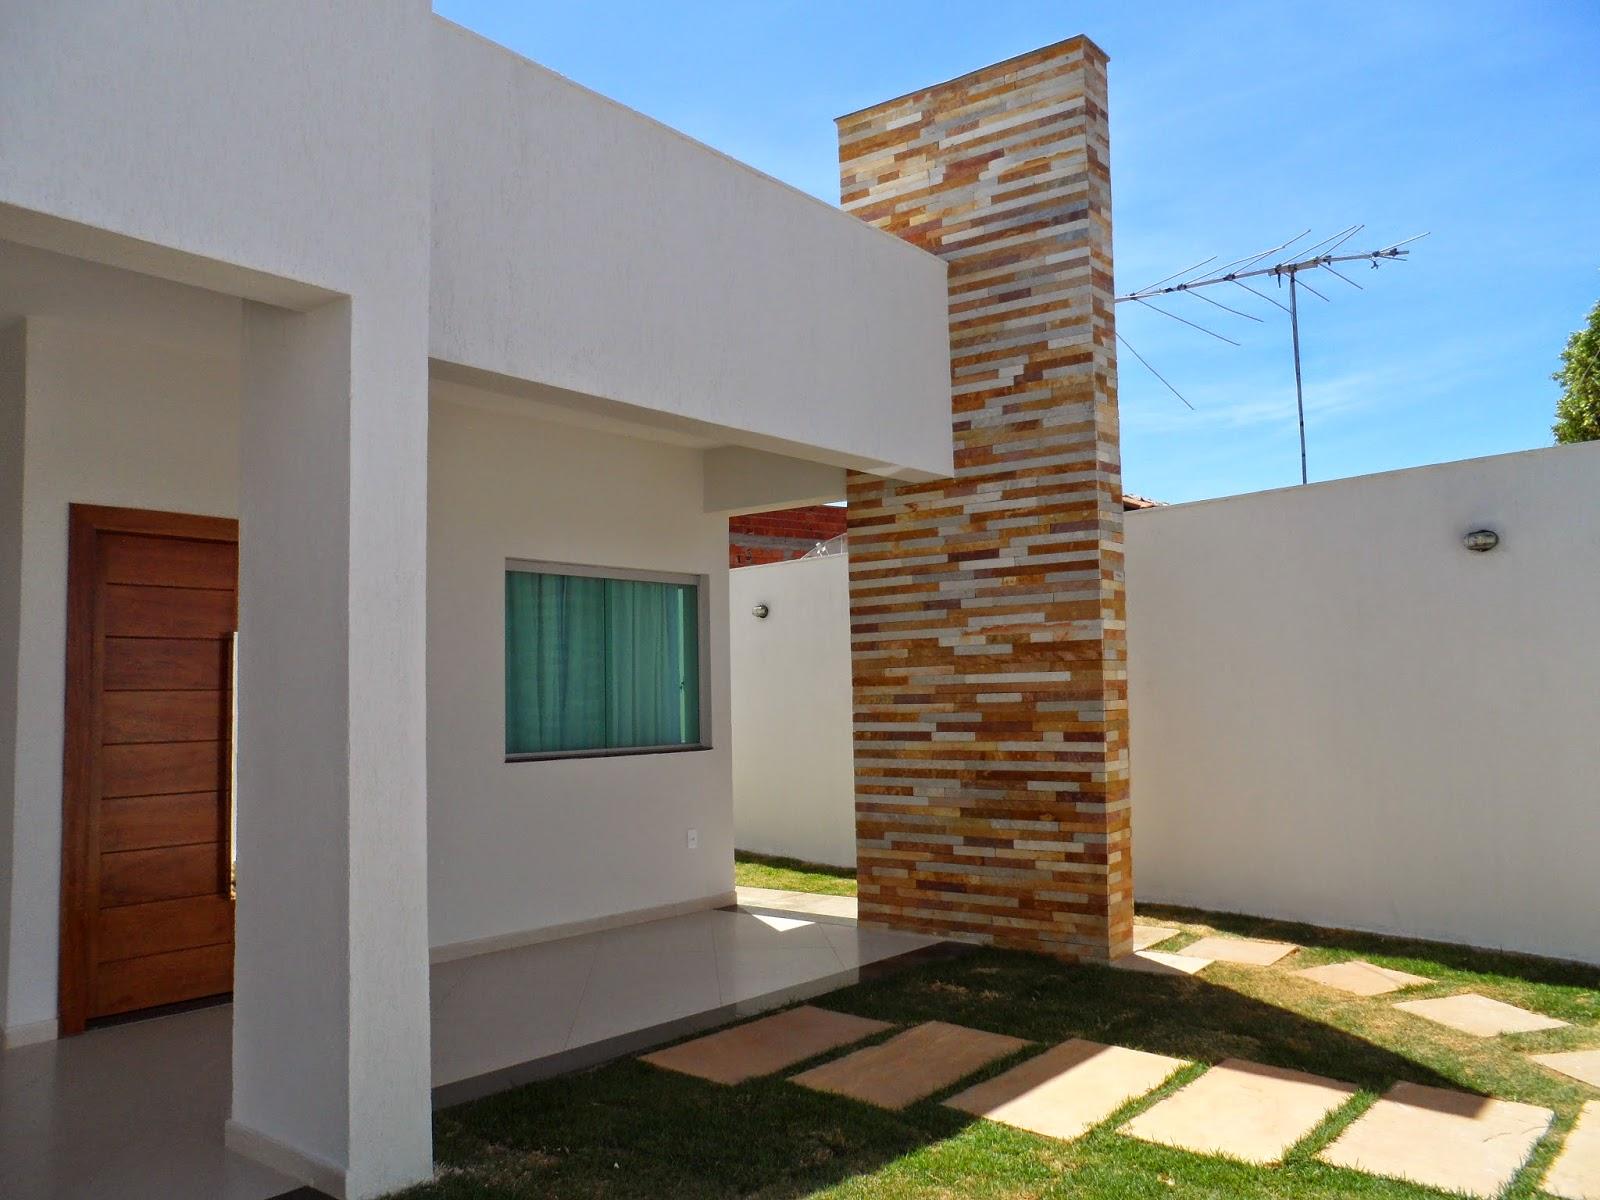 Di rio de constru o de uma casa pequena outubro 2014 - Reformas casas pequenas ...